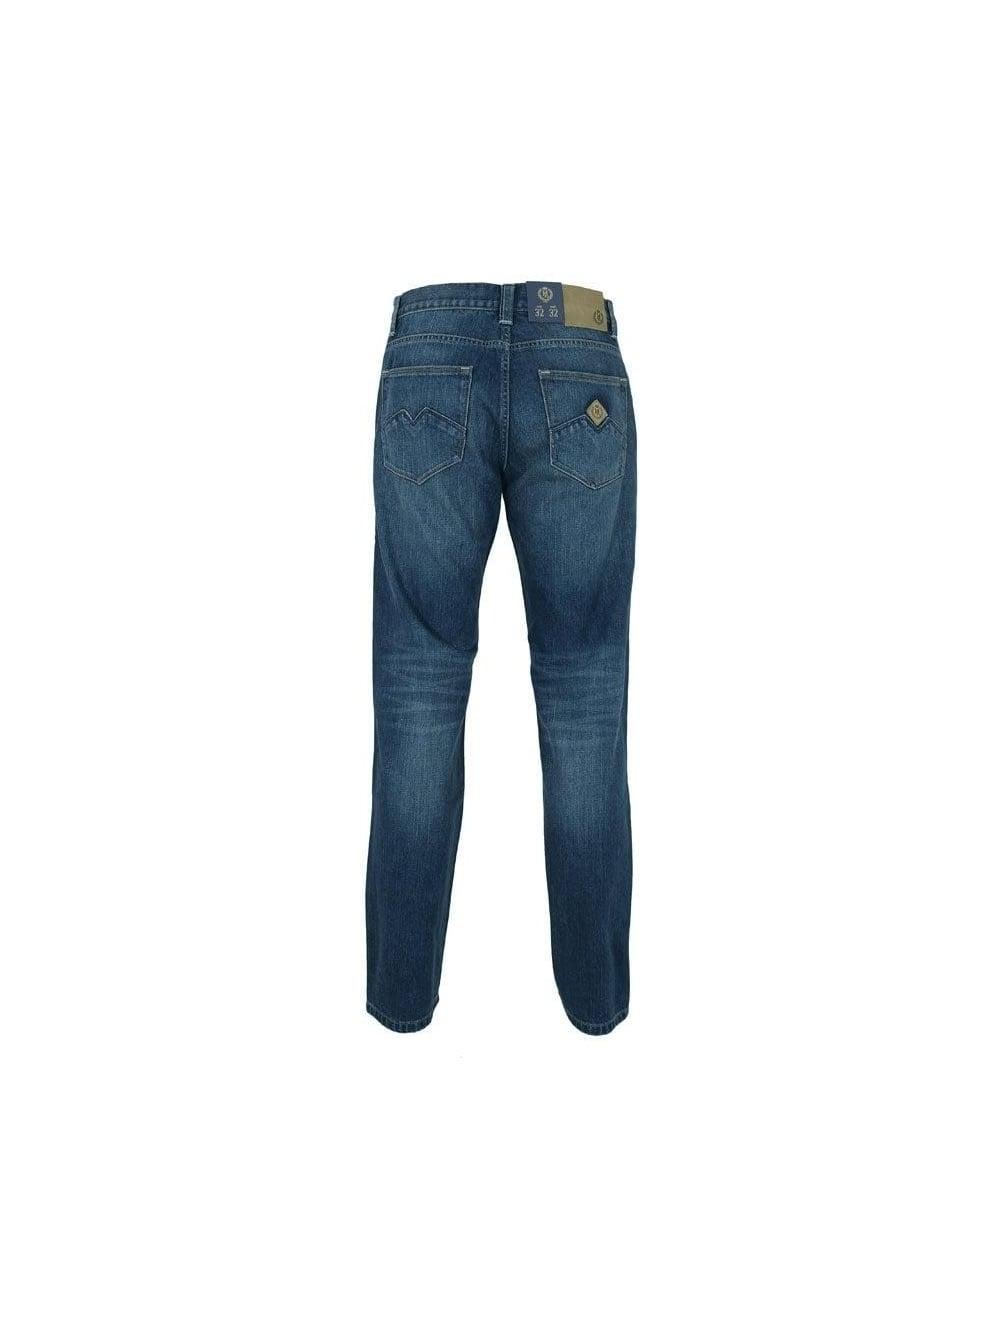 35289ced Henri Lloyd - Henri Lloyd Capstan Classic Fit Jeans - Vintage ...